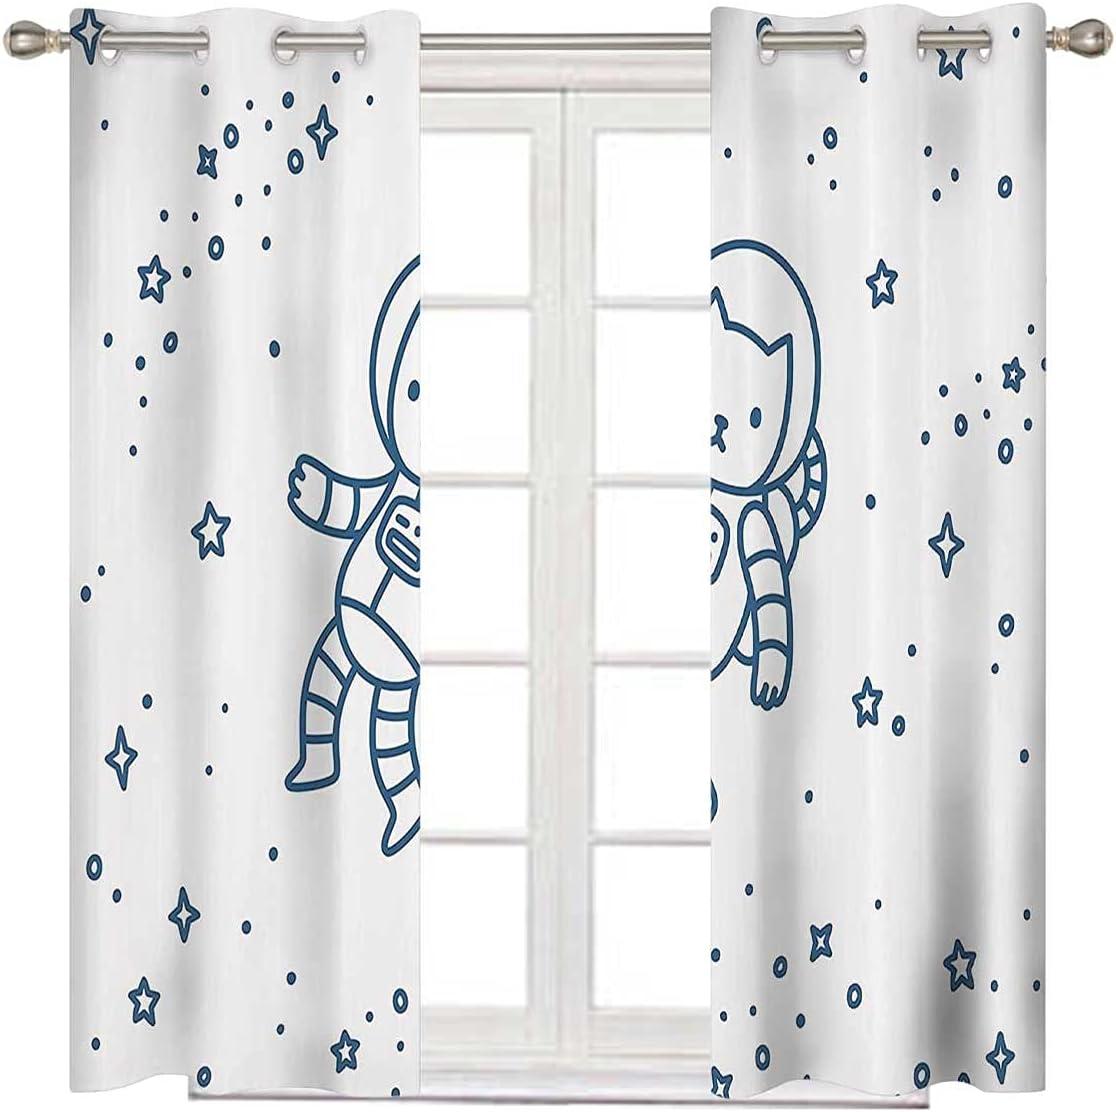 Kids Grommet Curtains Dark OFFicial site Super-cheap Window Blue Blackout